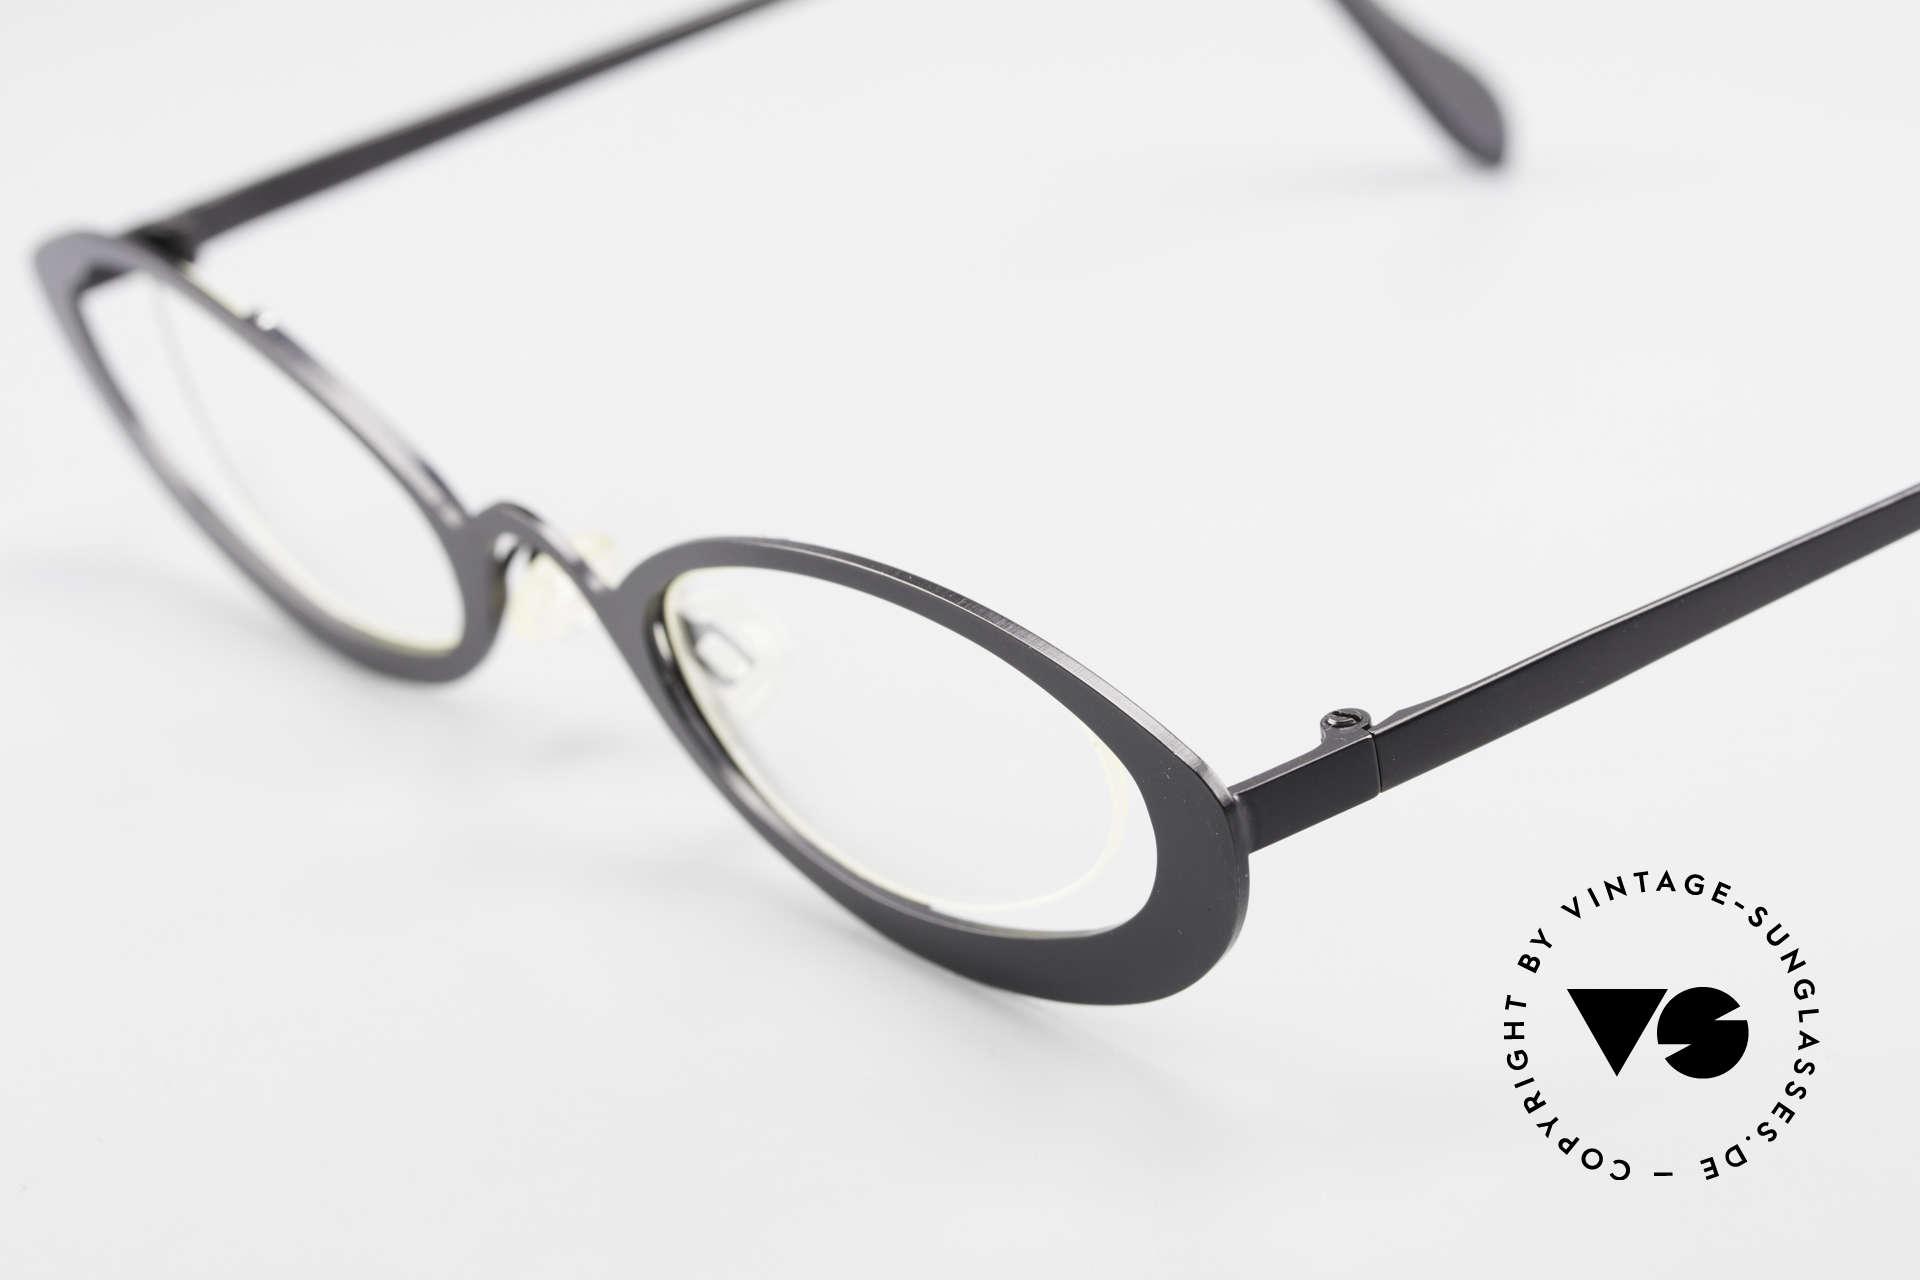 Theo Belgium RaRa Rimless 90's Cateye Glasses, an extraordinary designer piece by THEO BELGIUM, Made for Women